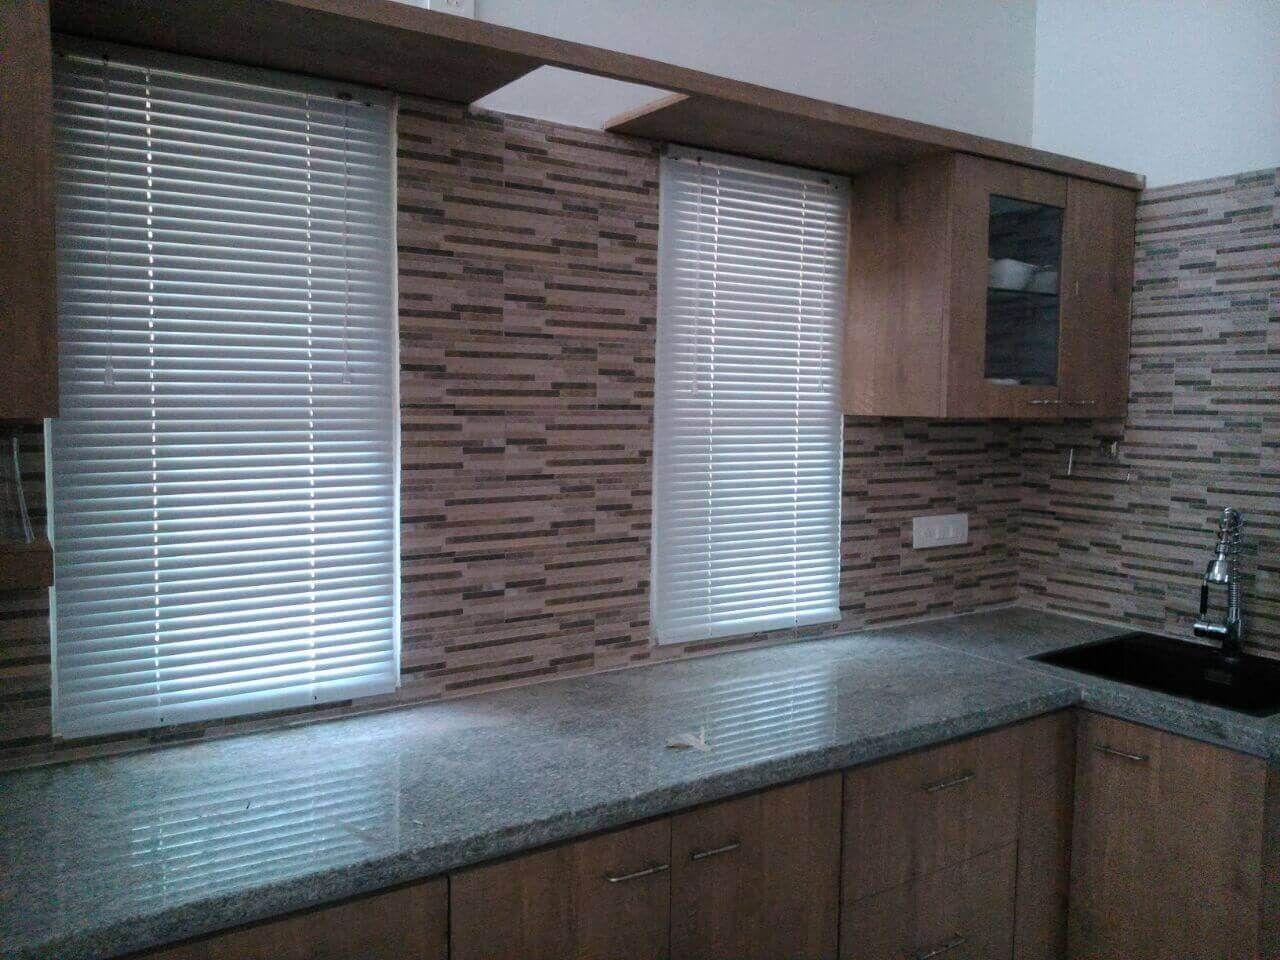 Kitchen window kerala  curtains  blinds  shades  kerala  rolling shades  vertical